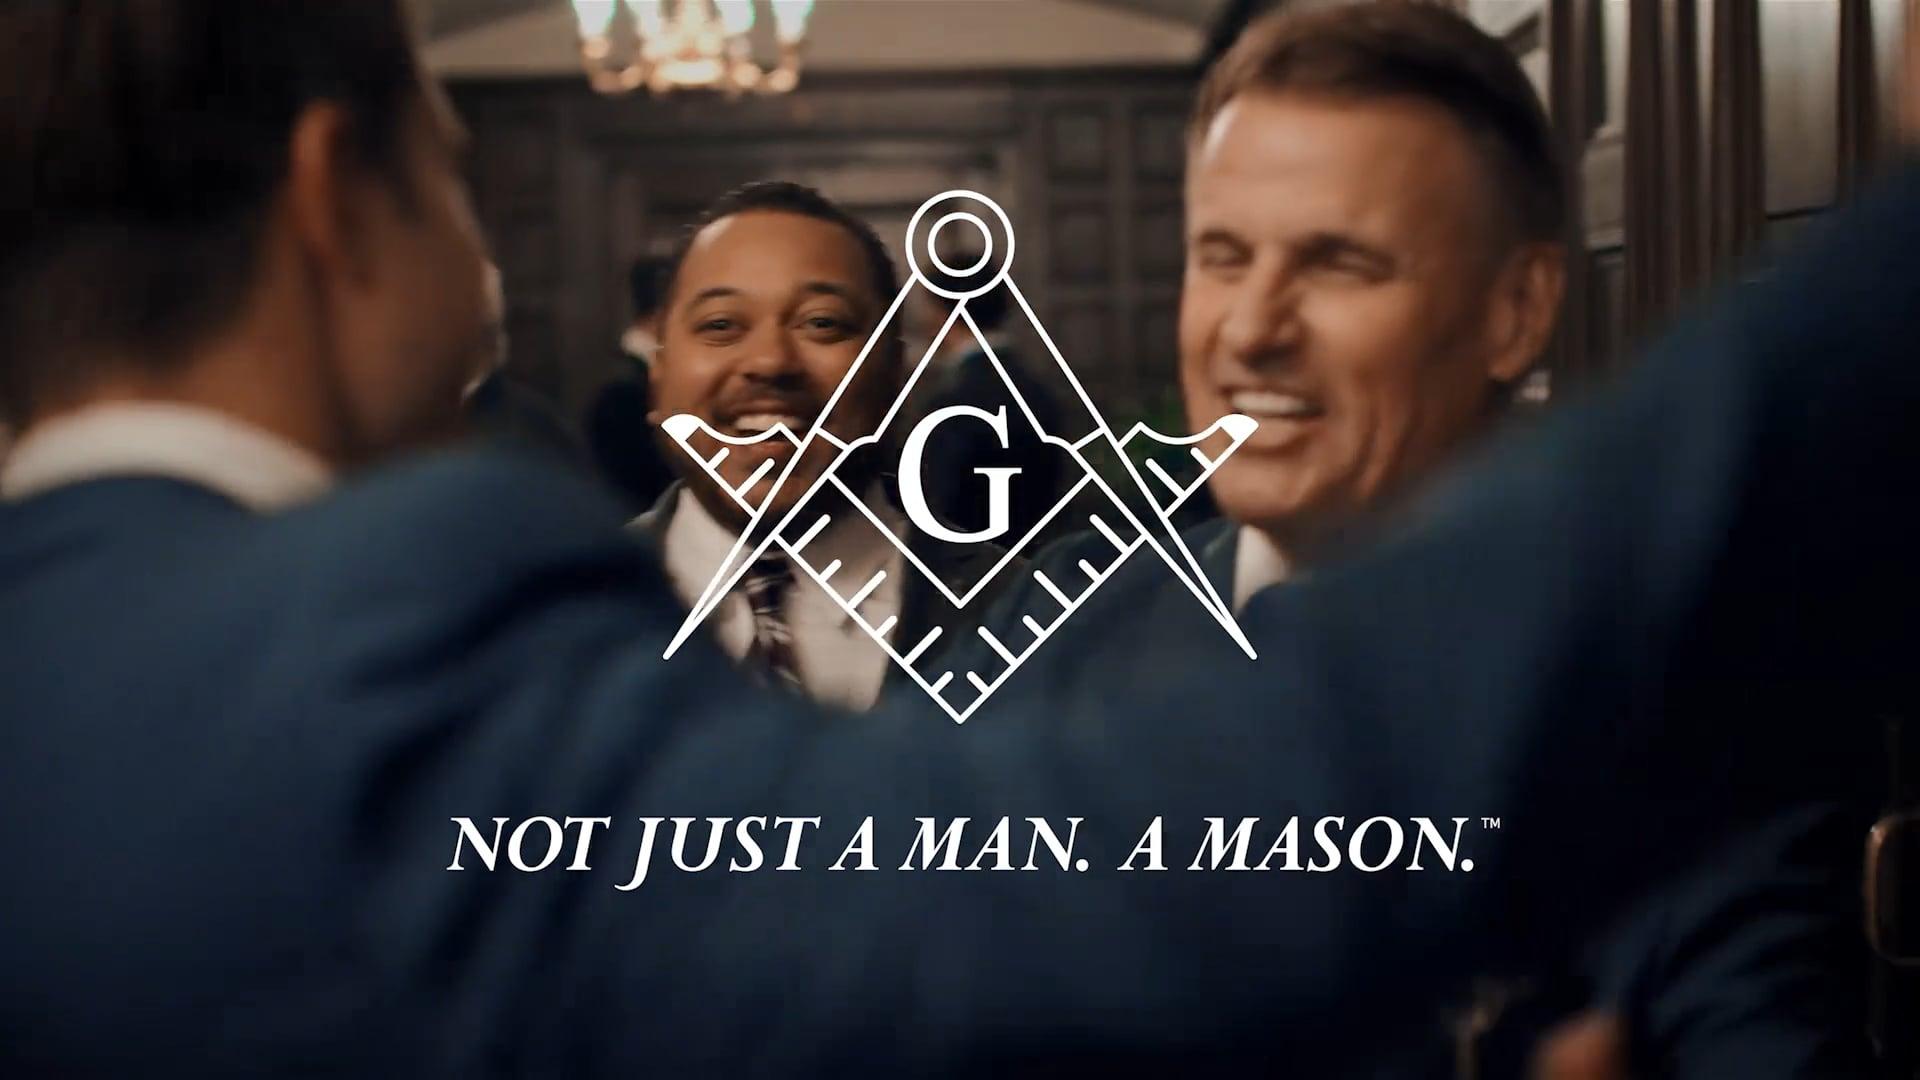 Nice Guys - Not Just a Man. A Mason. (30 Seconds) 2019